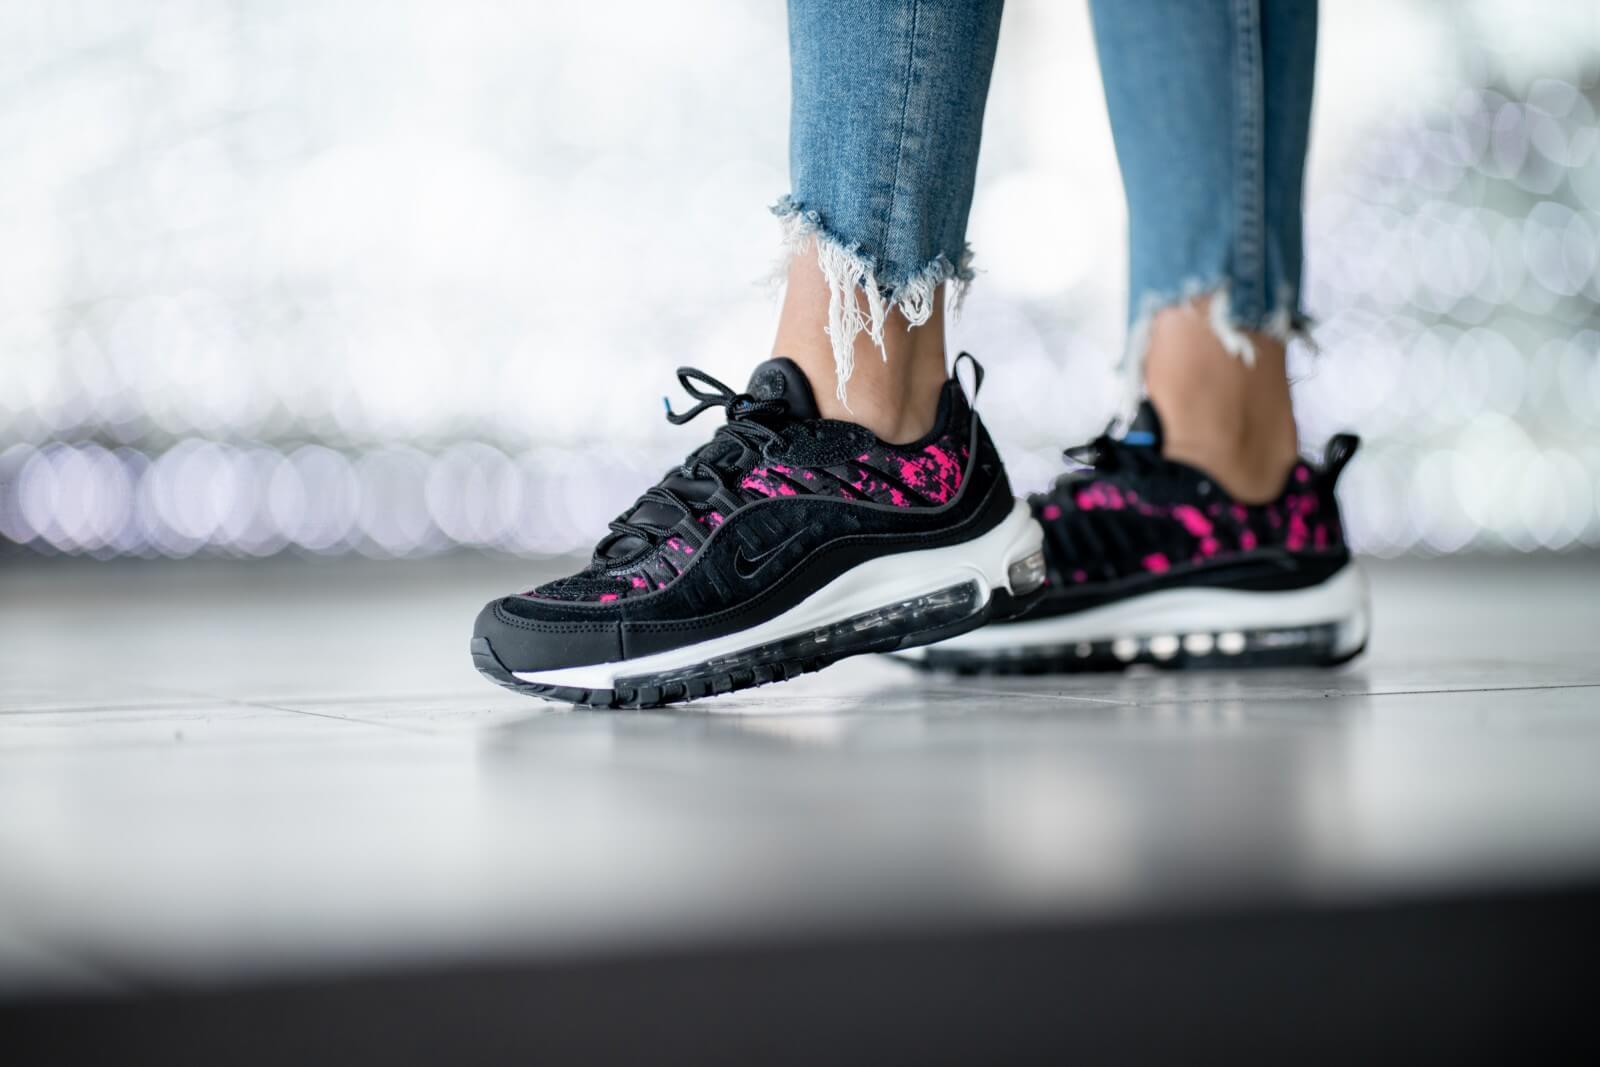 Nike Women's Air Max 98 Premium Camo Black/Hyper Pink - CI2672-001